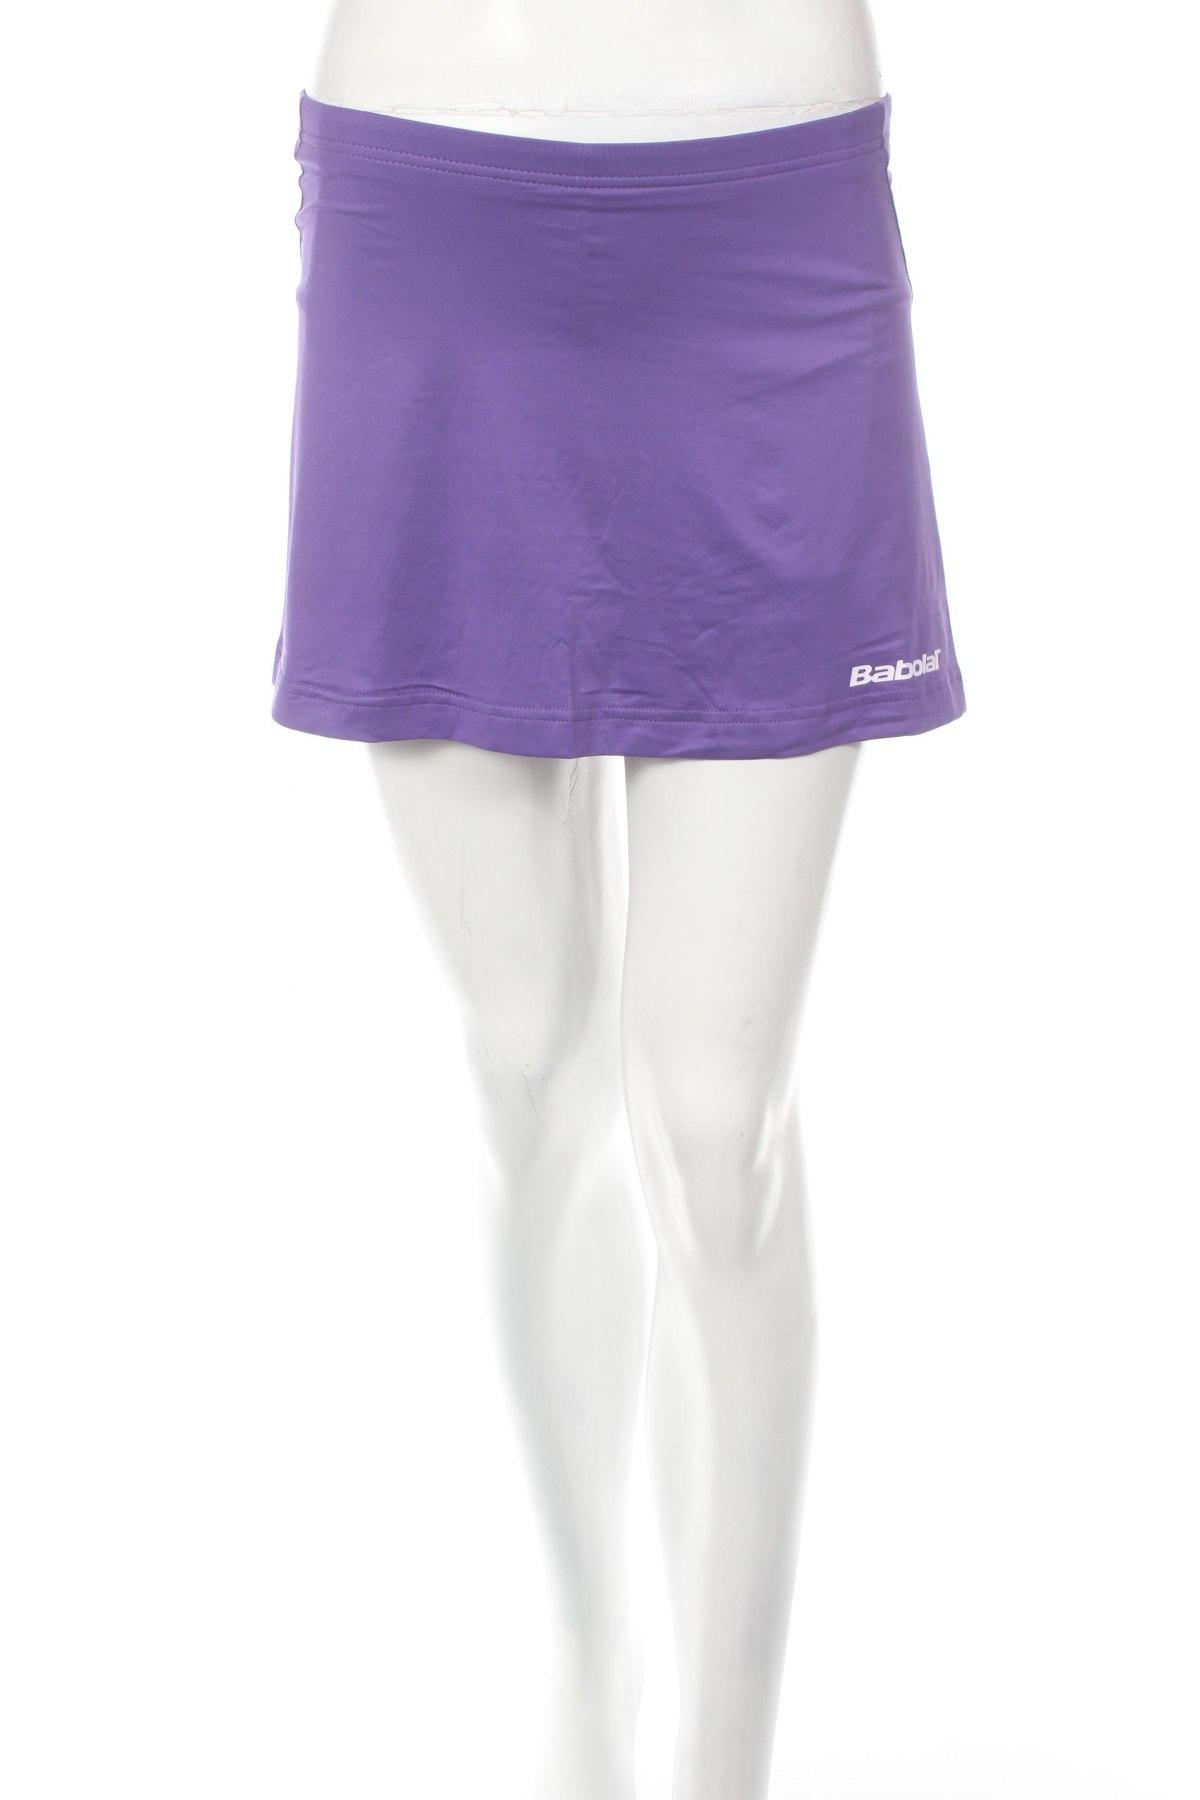 Пола - панталон Babolat